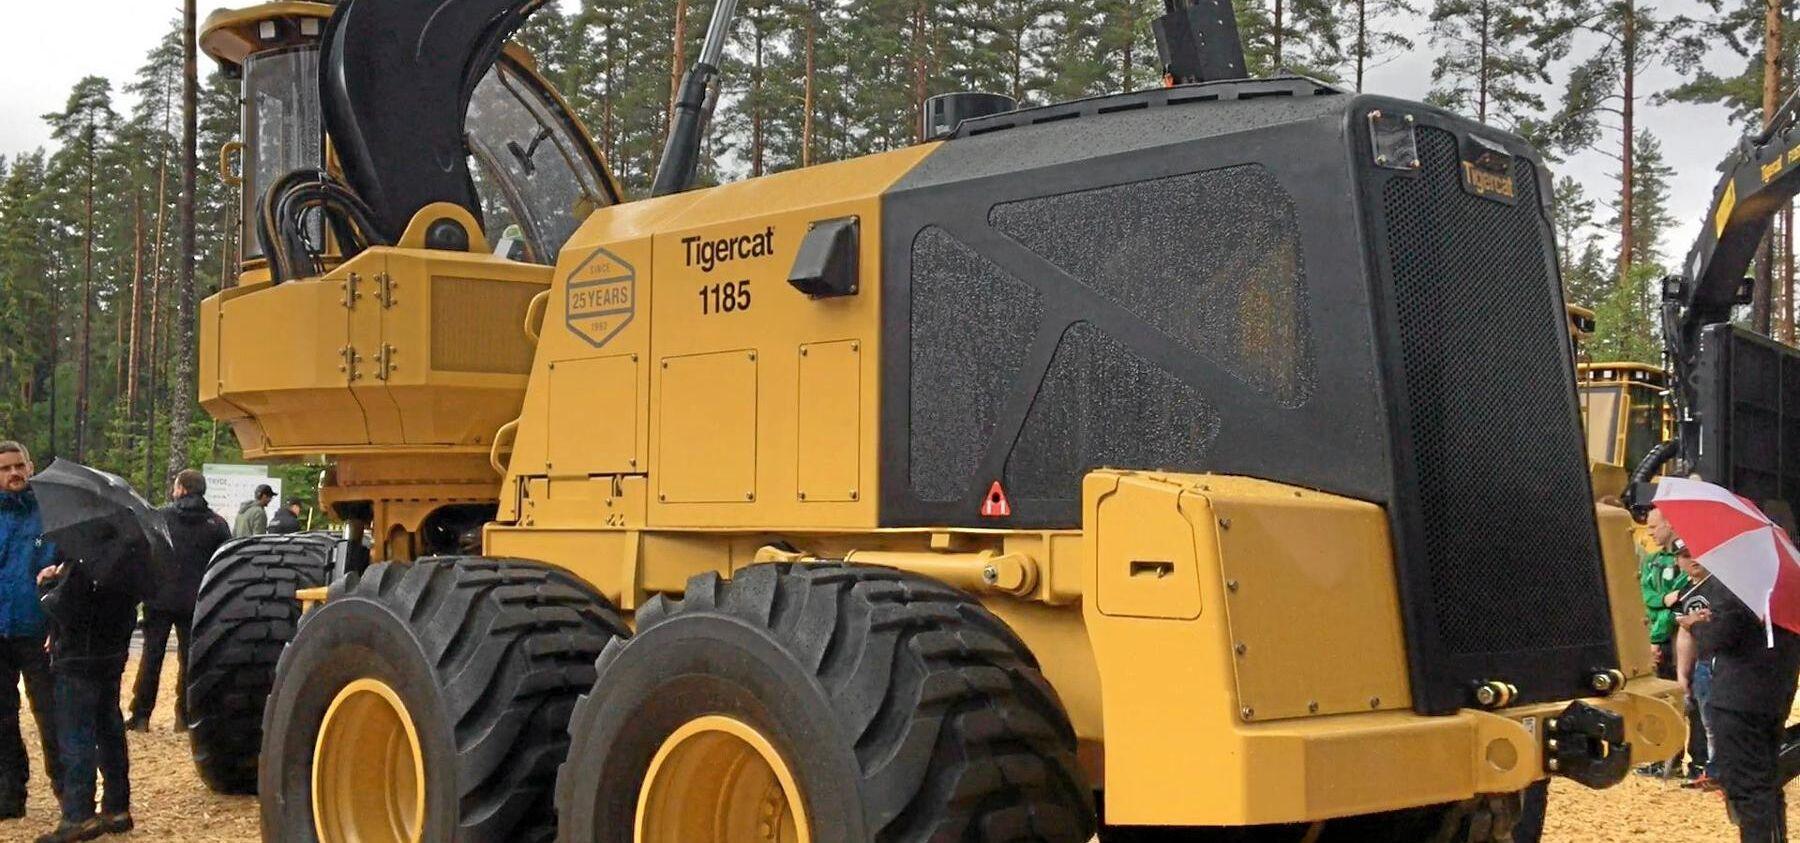 Maskinen går under modellbeteckningen 1185.